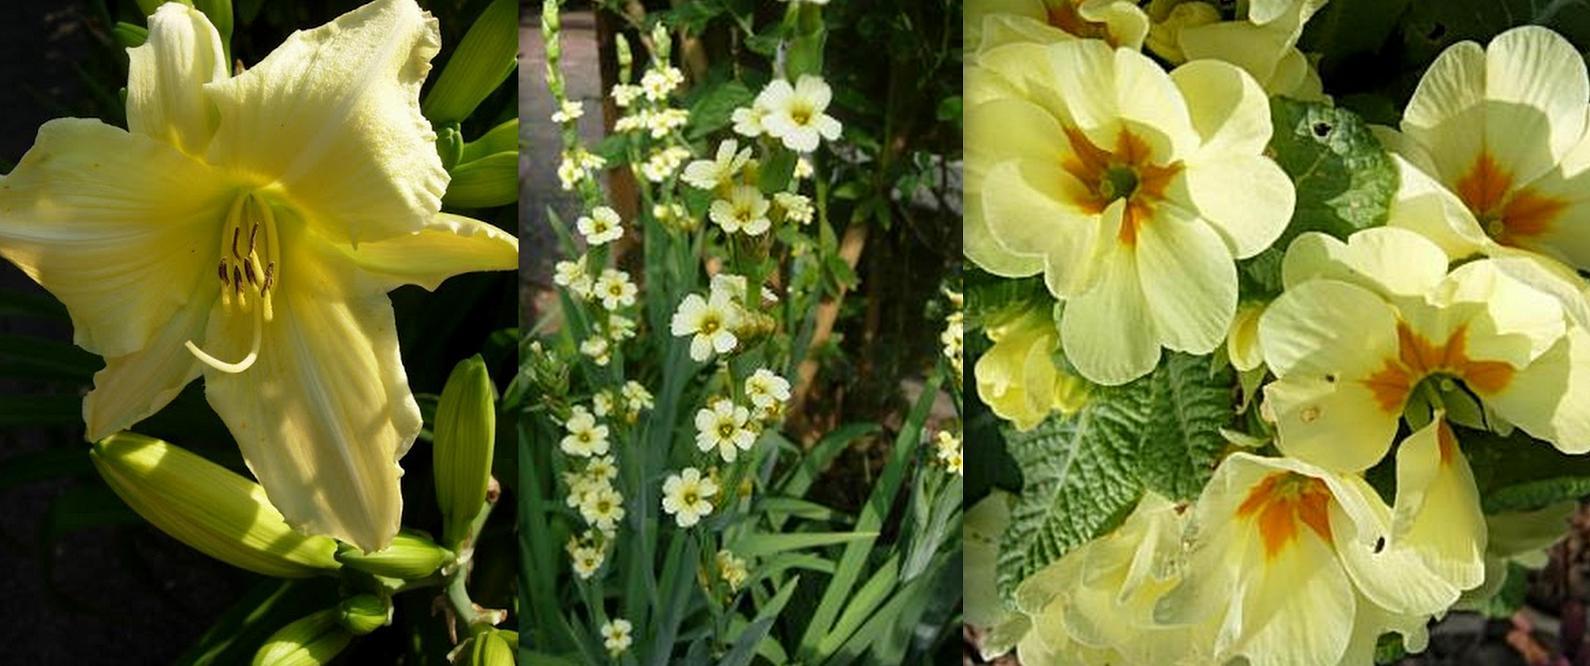 Gartendeko Blog Gartenideen Pflanzen als Dekoelemente